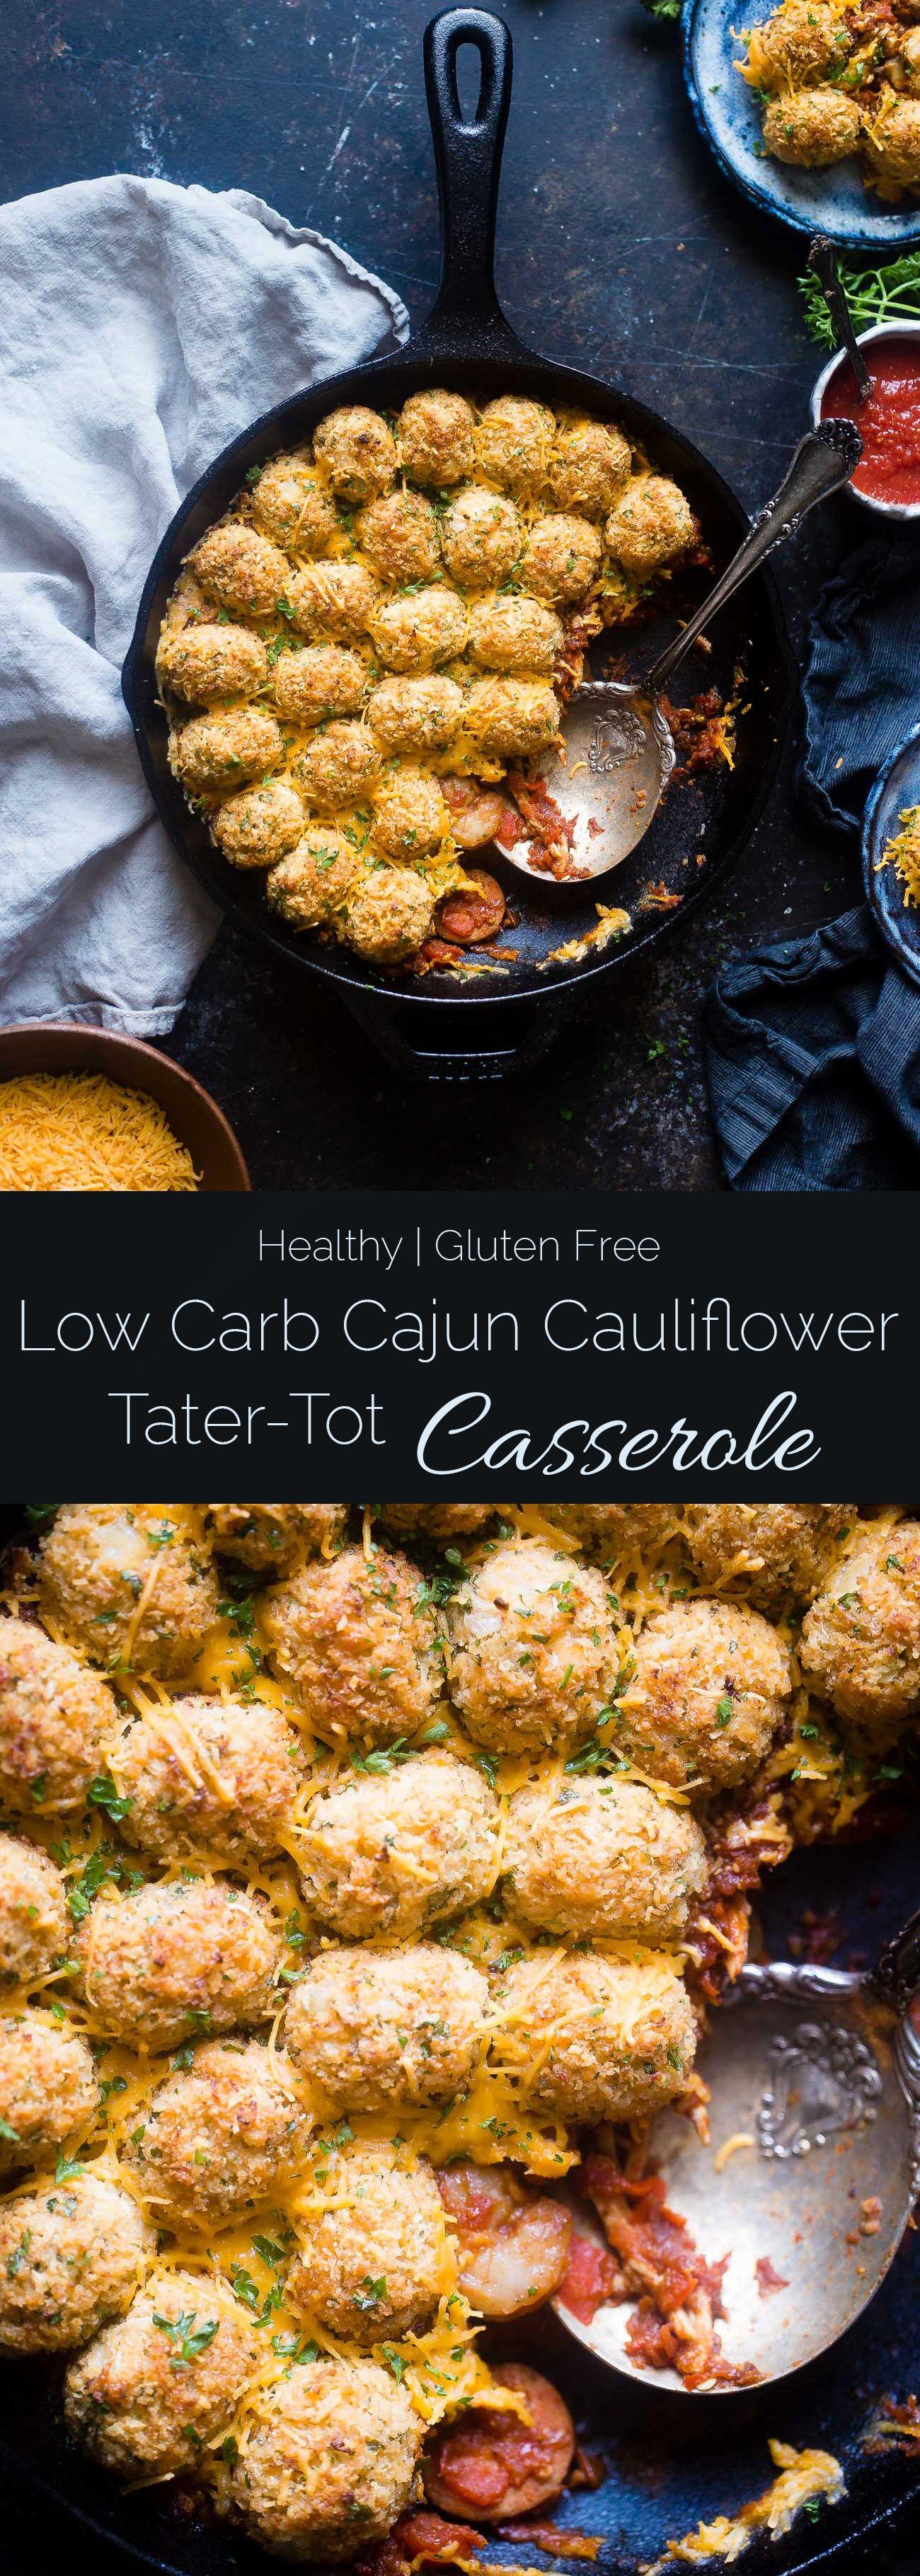 Cajun Cauliflower Tot Casserole - This lower carb, cheesy ...